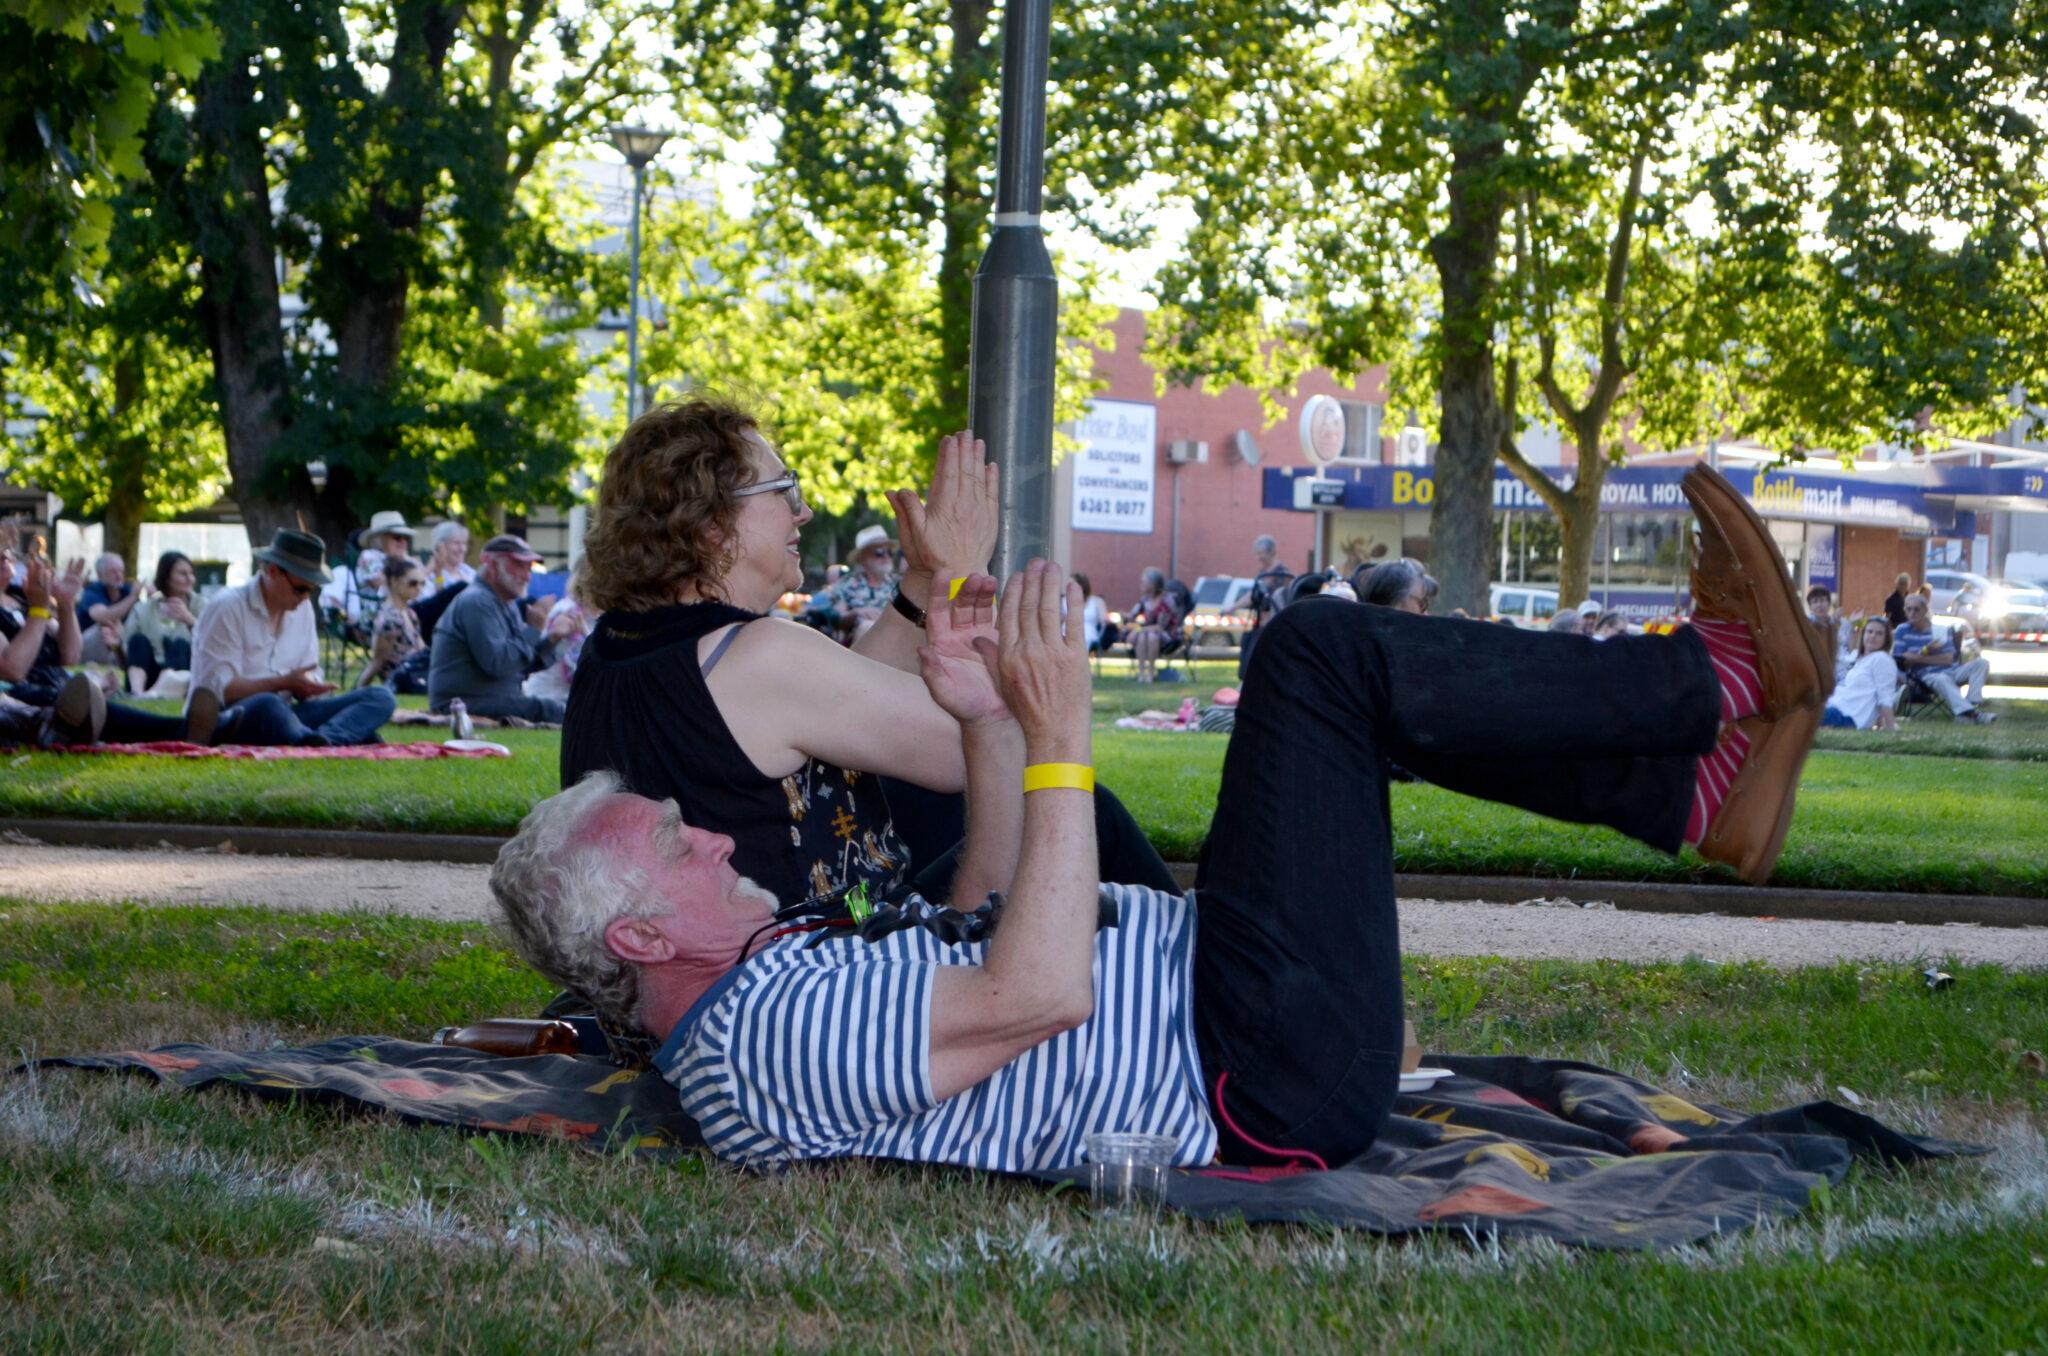 Two people enjoying the music